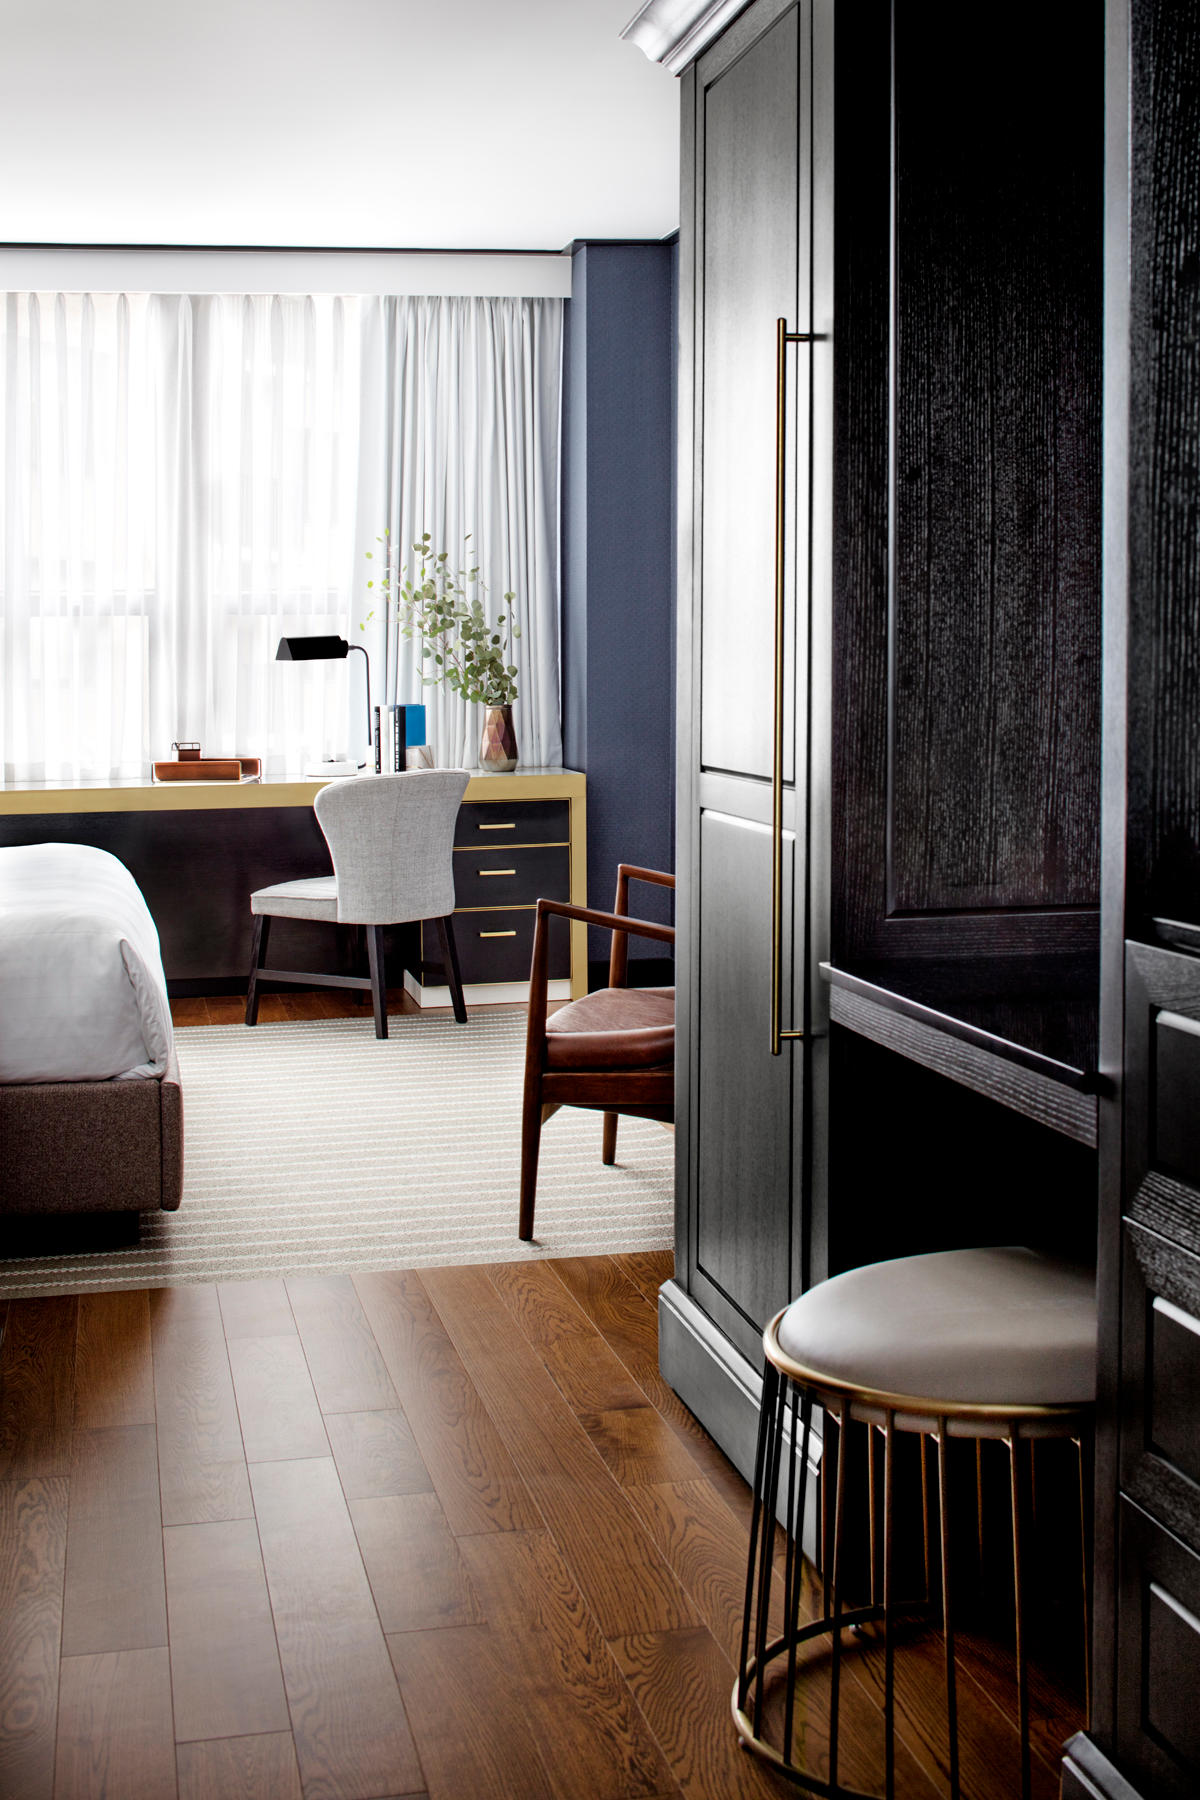 St. Gregory Hotel Dupont Circle image 23